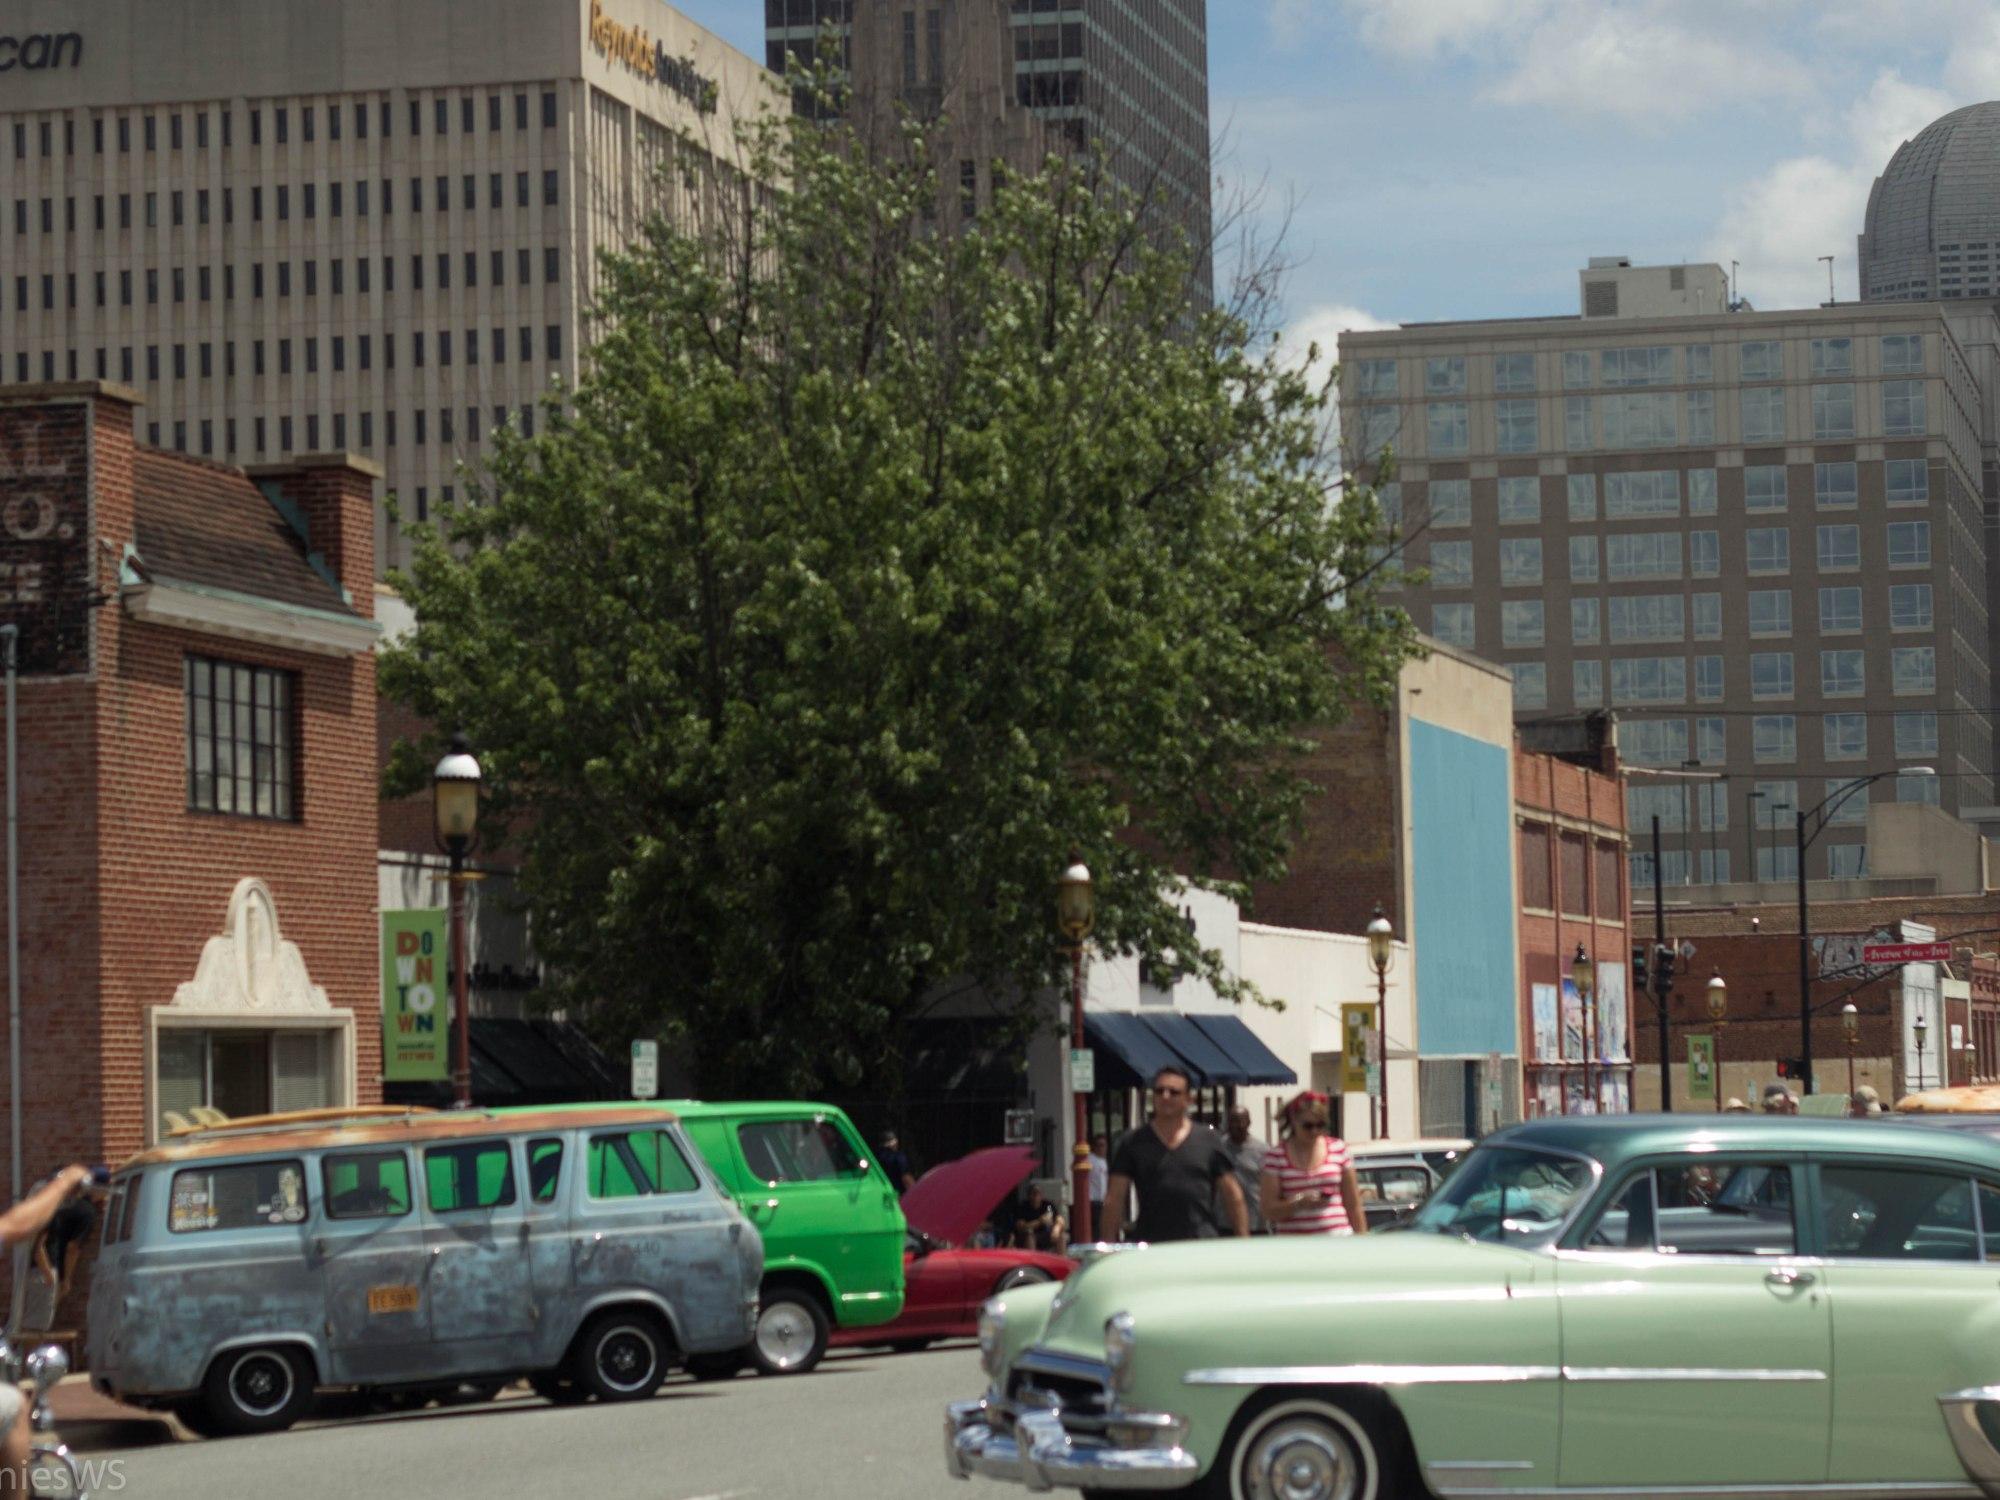 Downtown Winston-Salem, TowniesWS.com